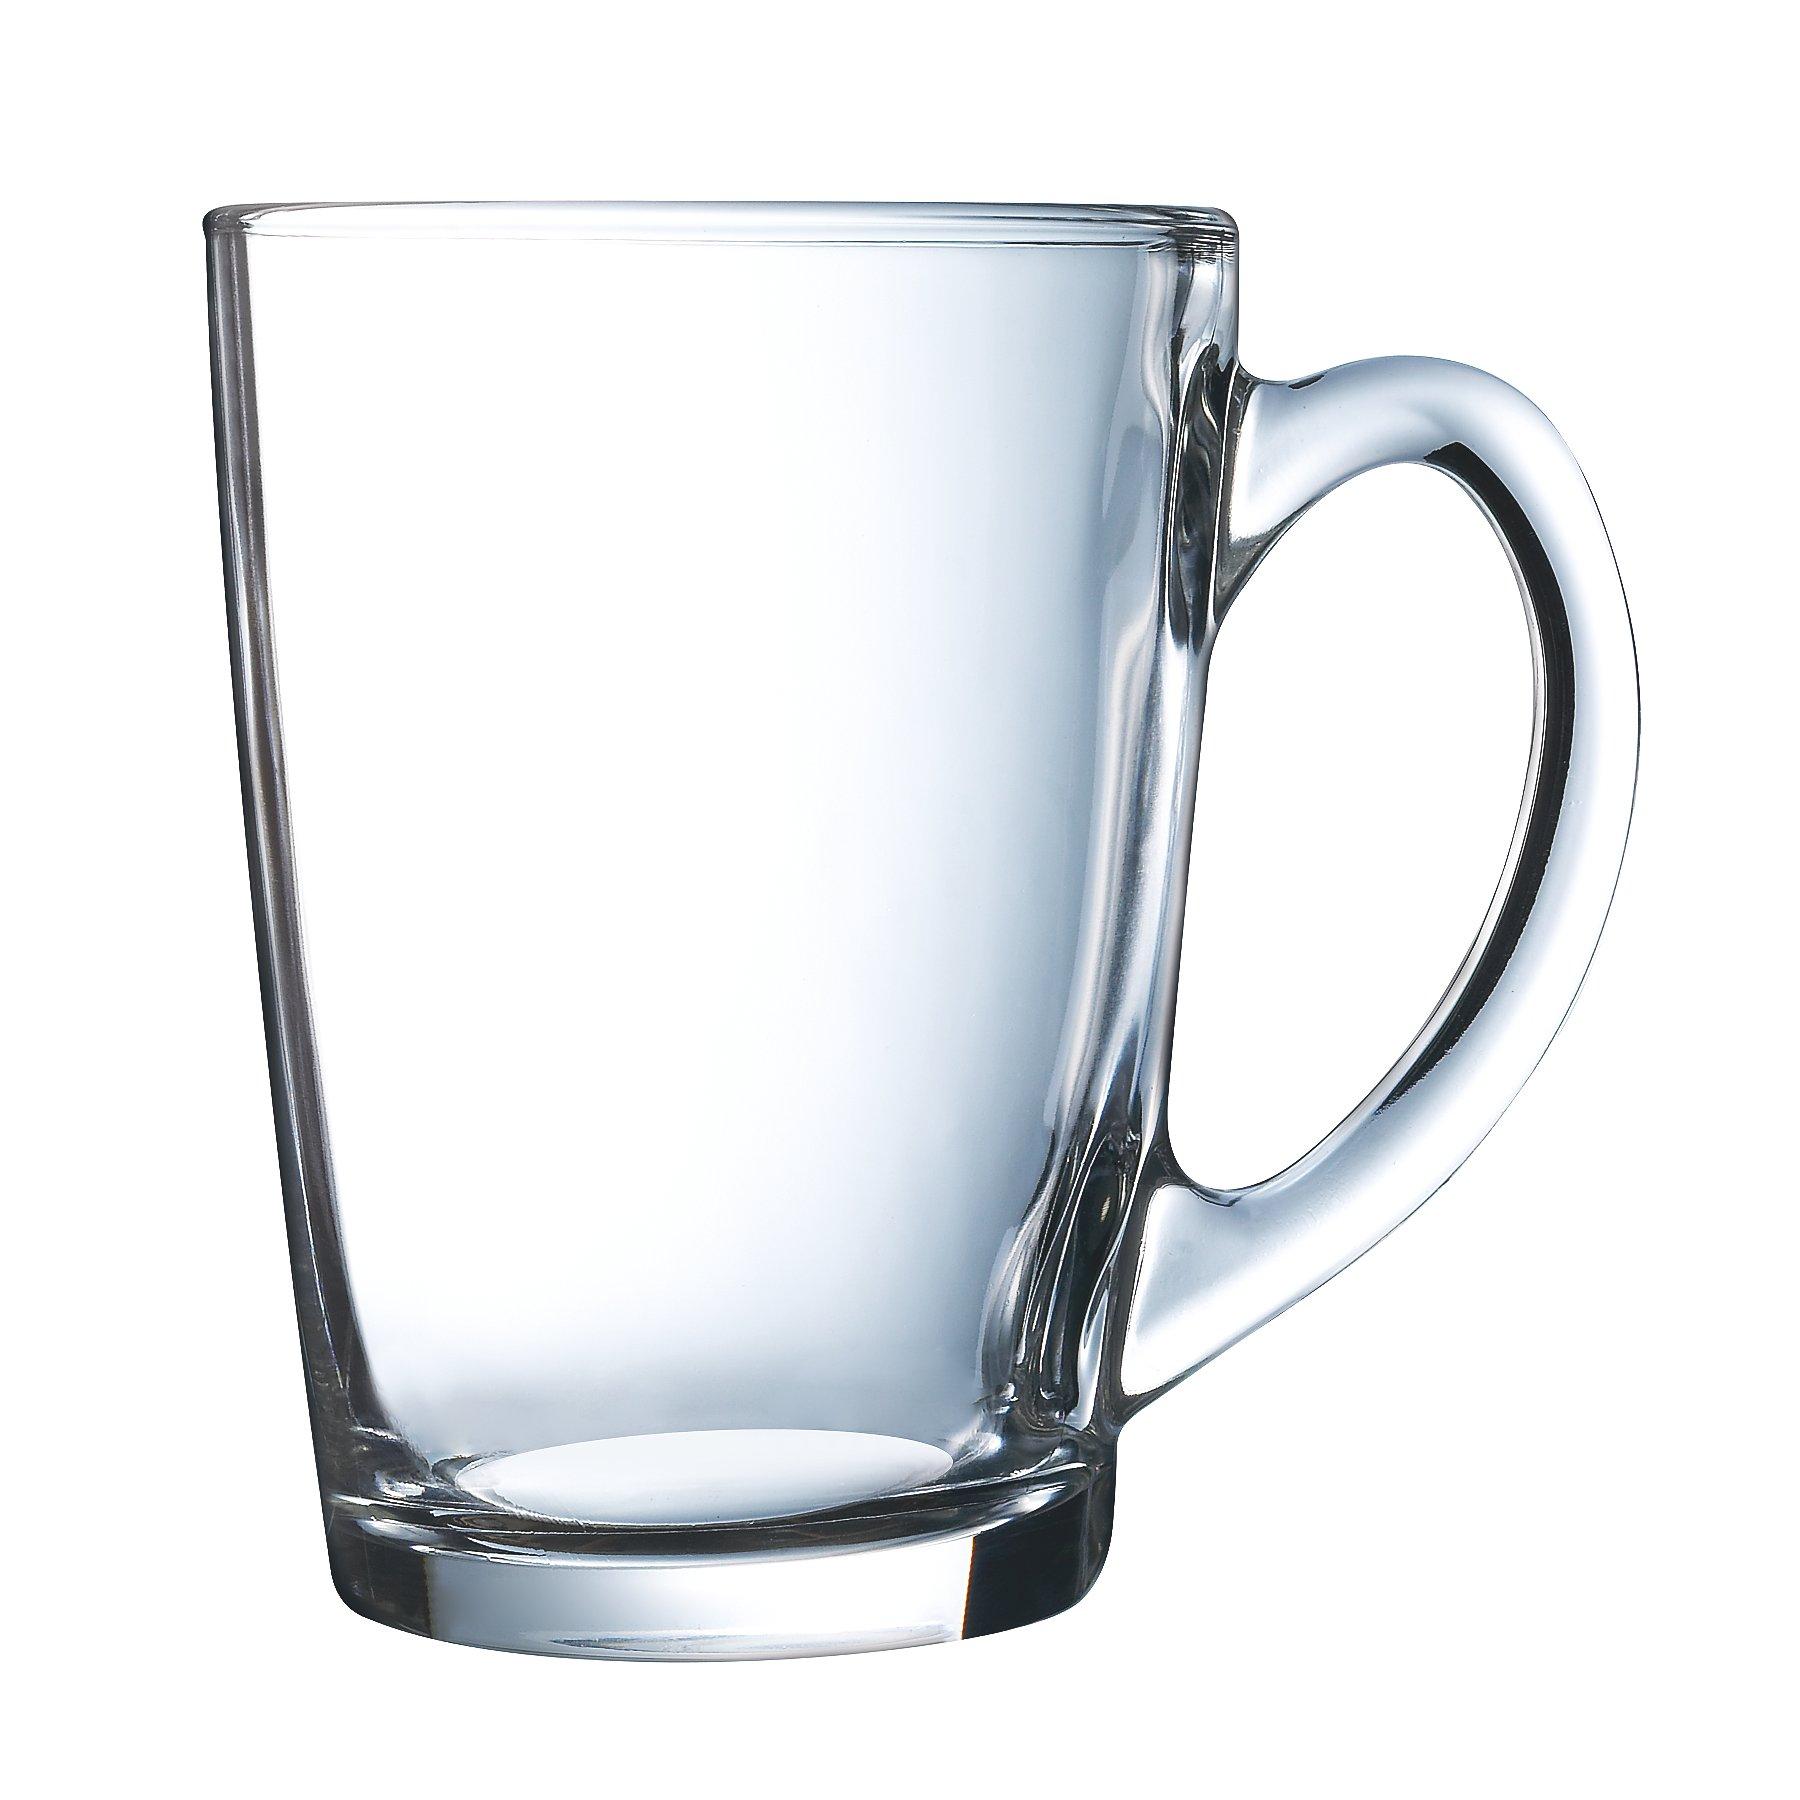 Café Latte Glass Set of 4